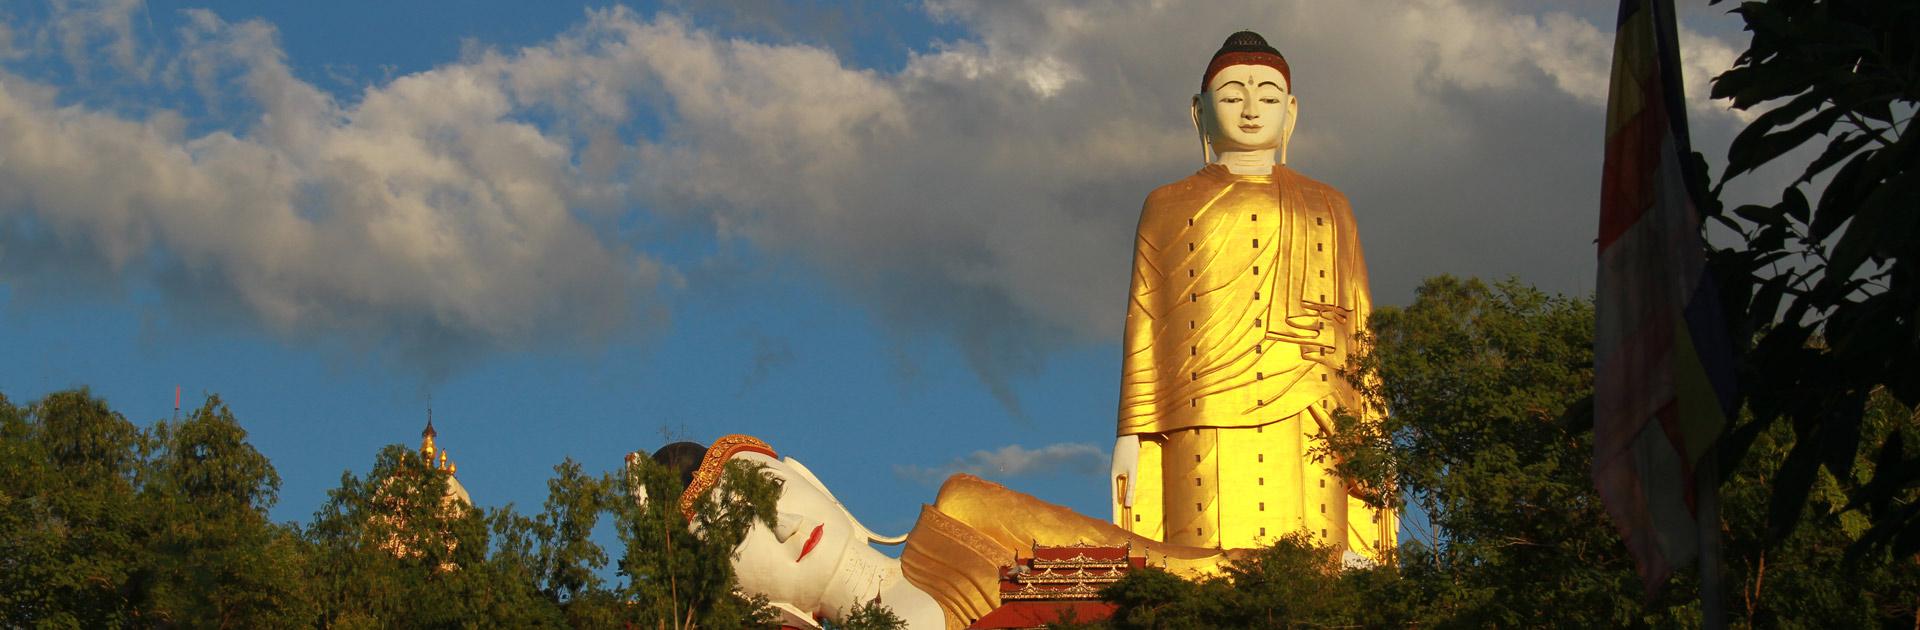 MM Tradición de Myanmar 13 días 3